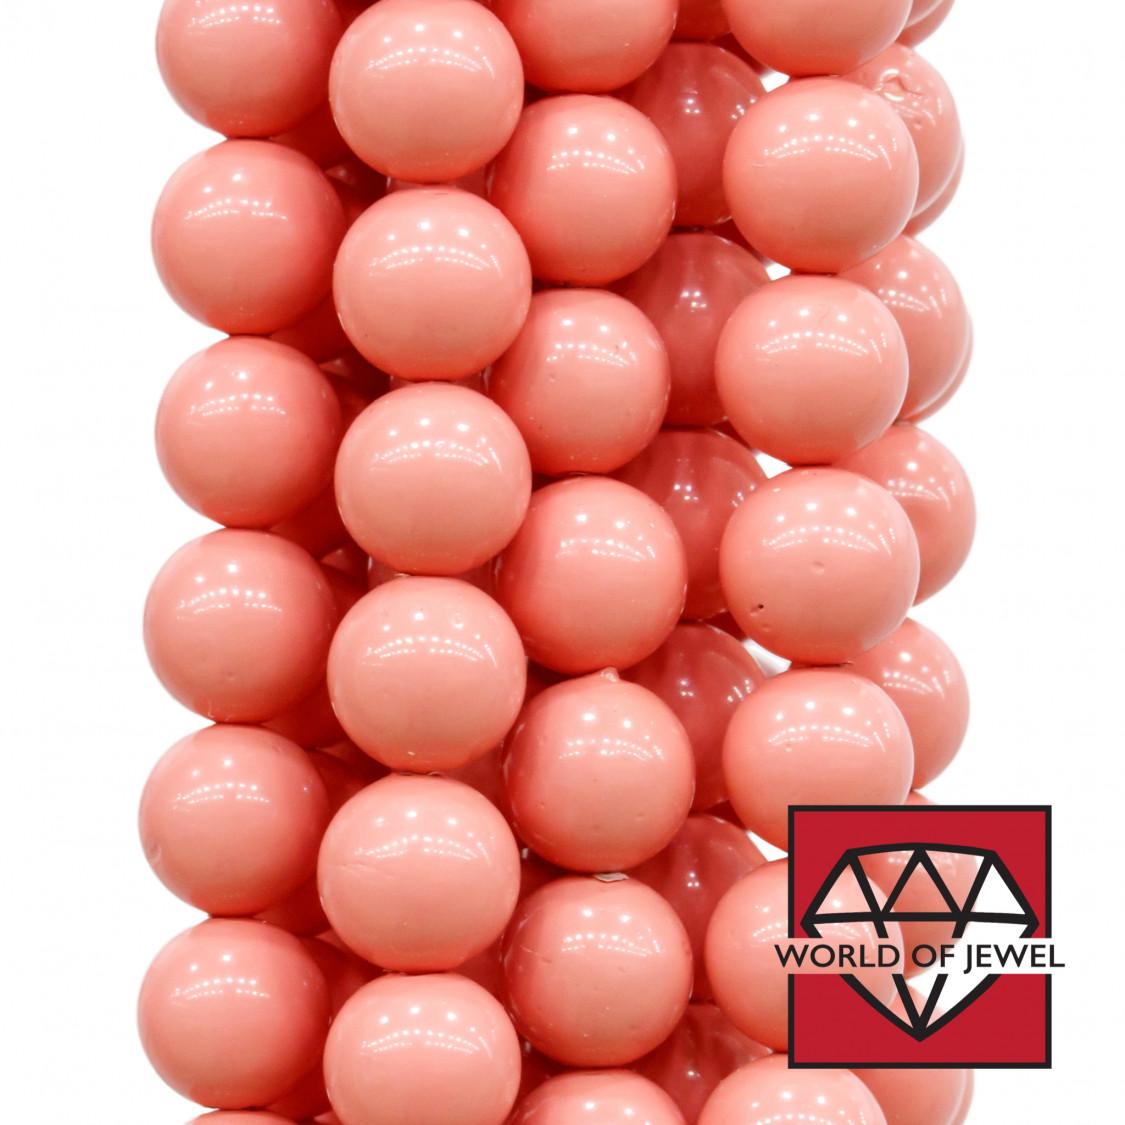 Perle di Maiorca Rosso Tondo 10mm